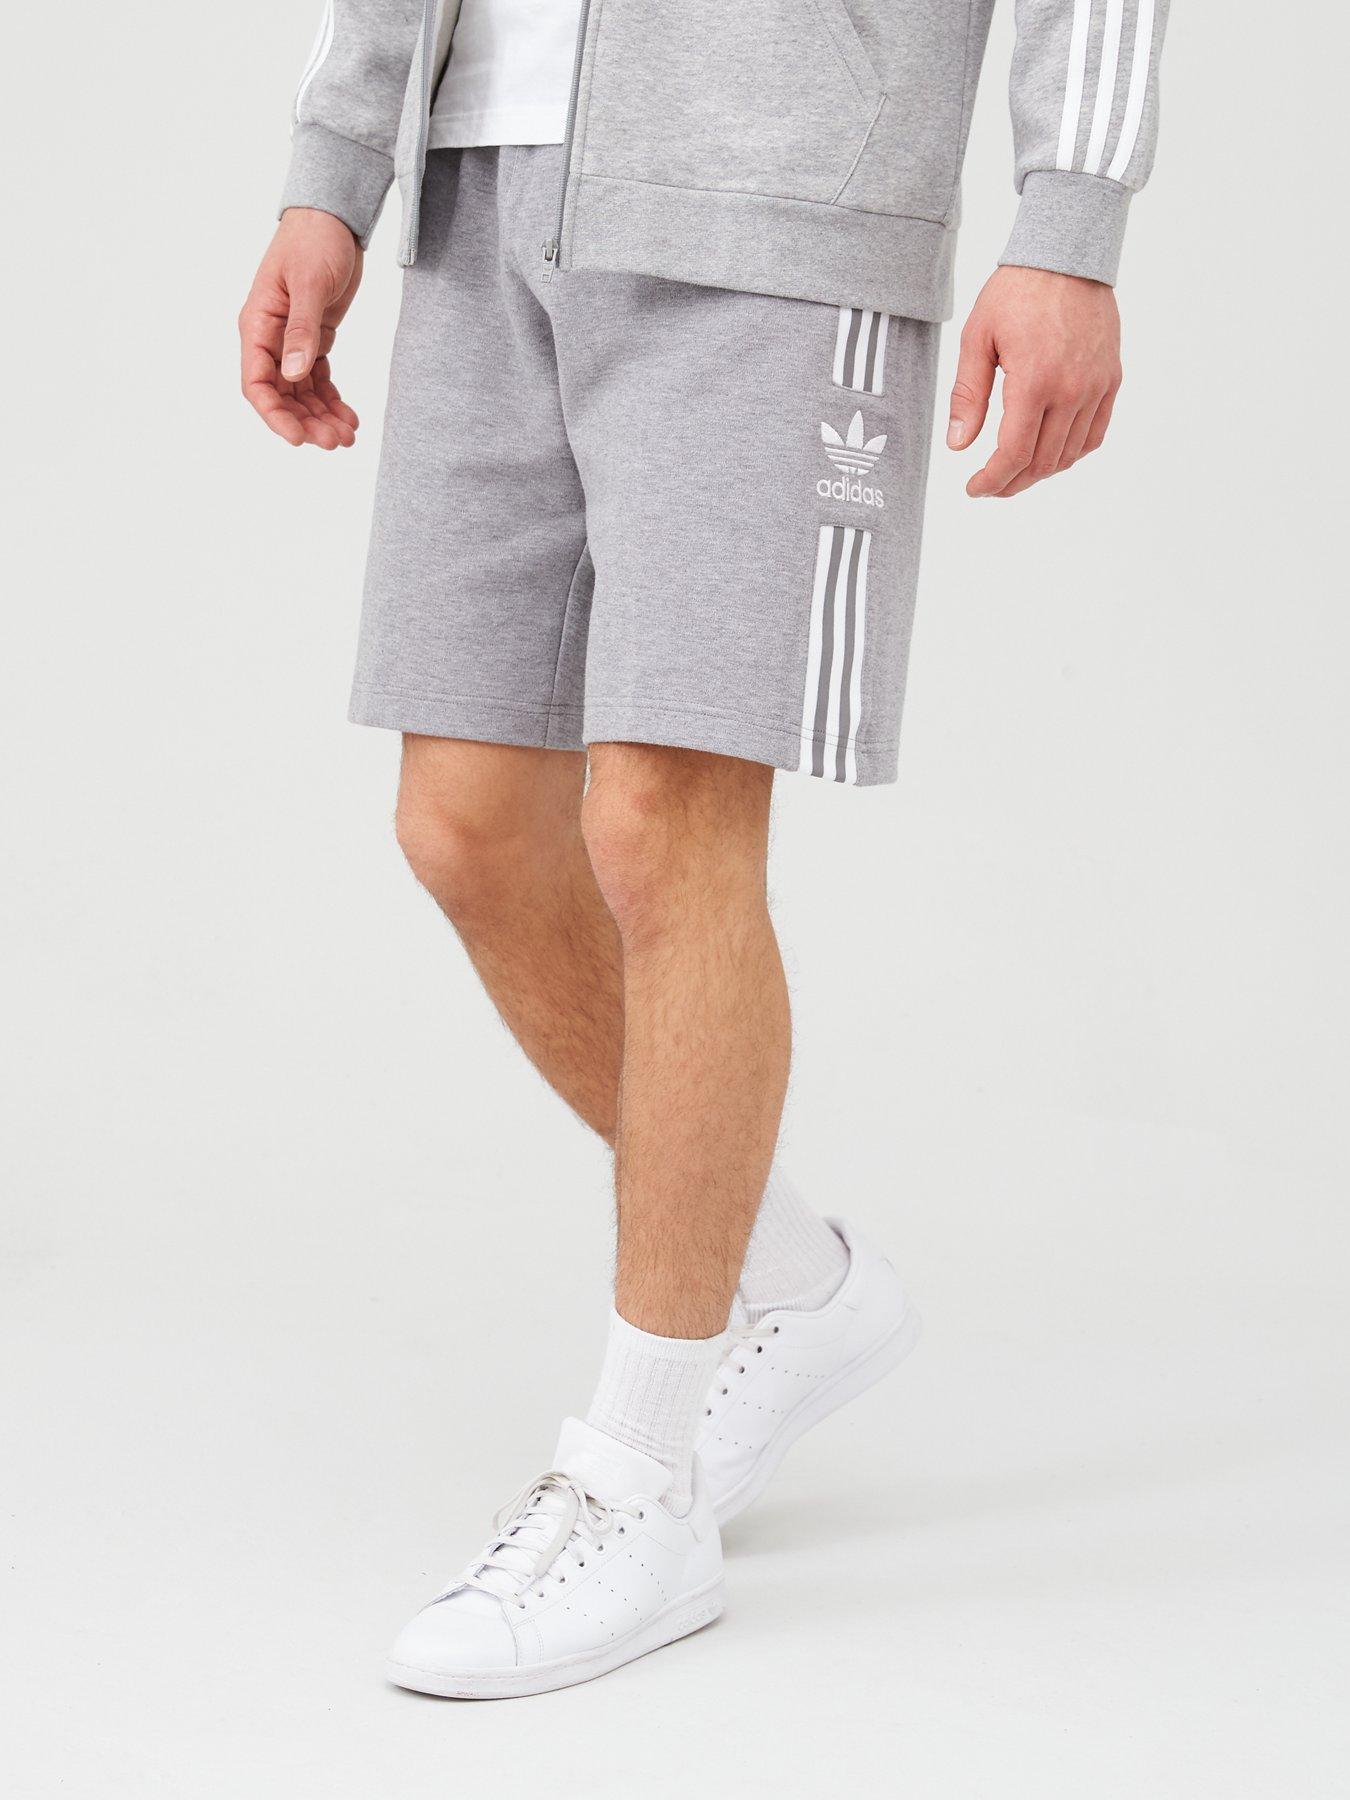 adidas shorts very